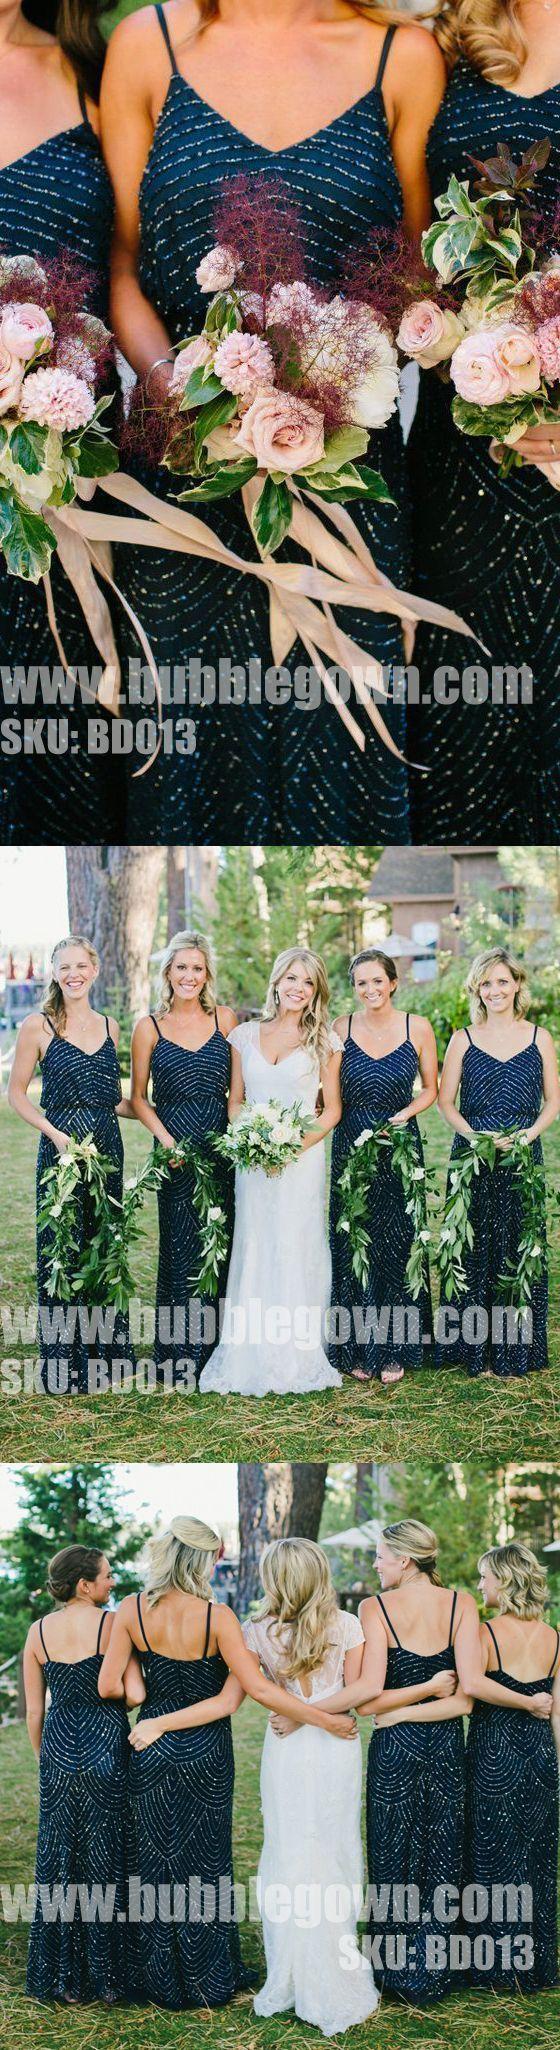 Popular Elegant Spaghetti Strap Formal Cheap Bridesmaid Dresses for Wedding BD013